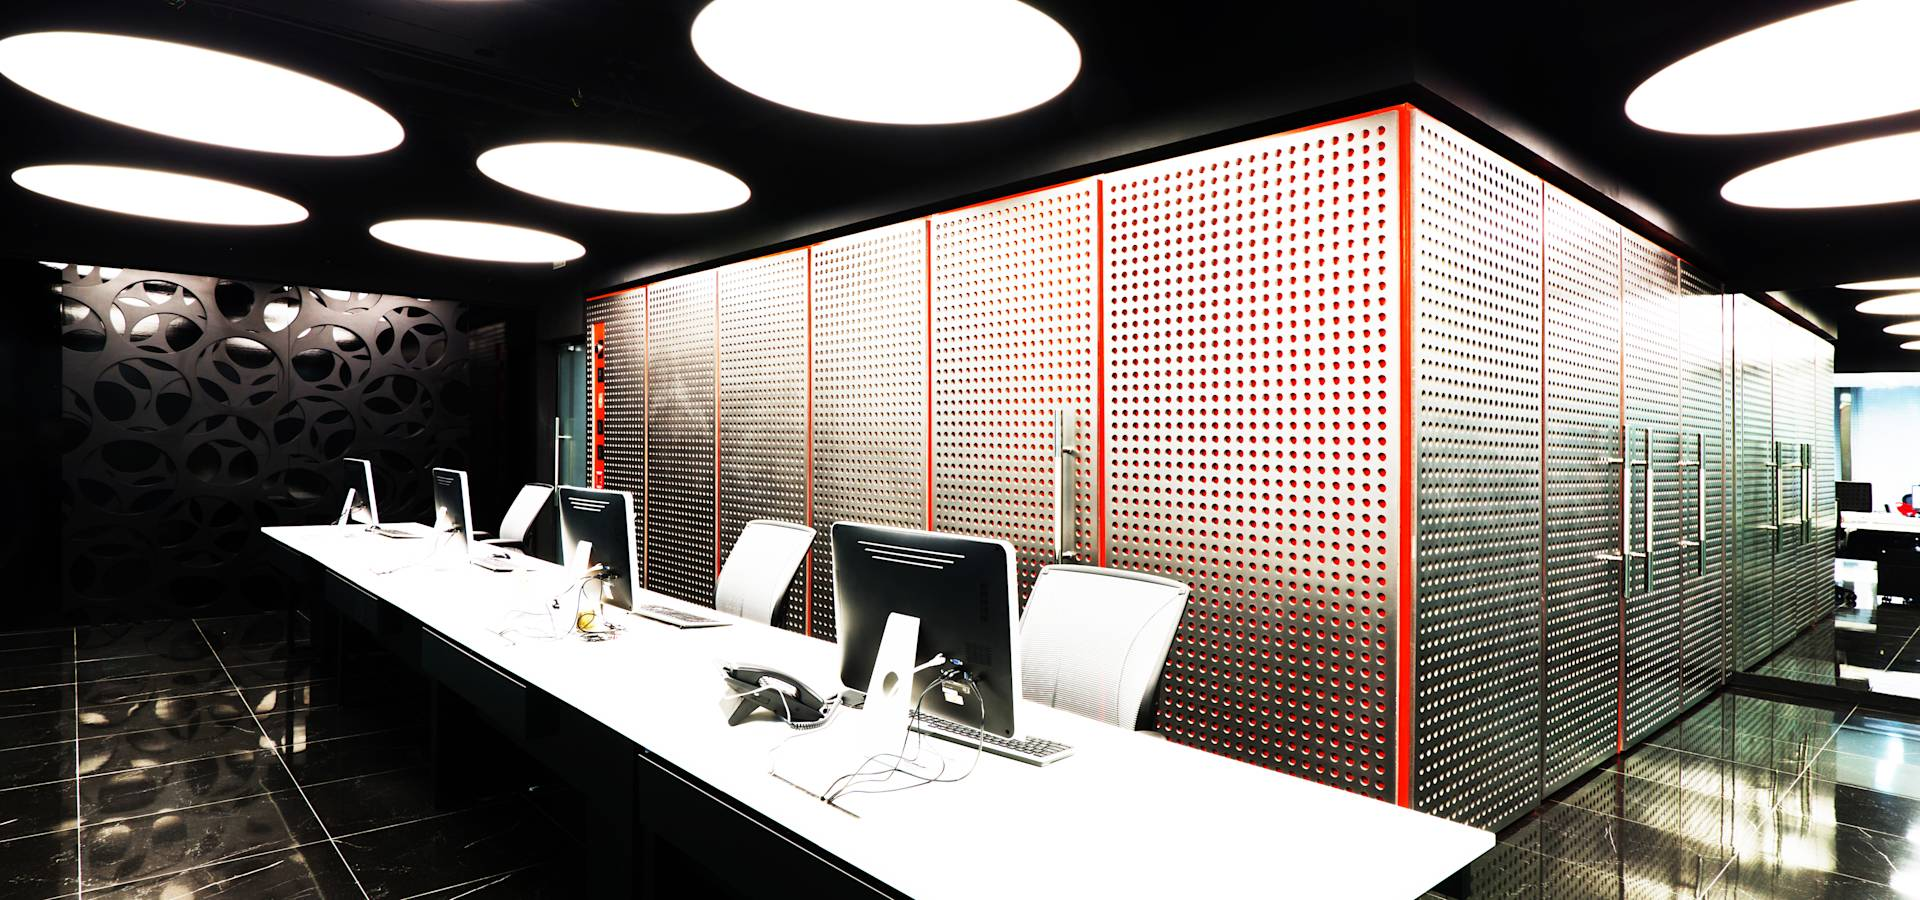 Tragaluz estudio de arquitectura arquitectos en caracas for Oficinas grupo tragaluz